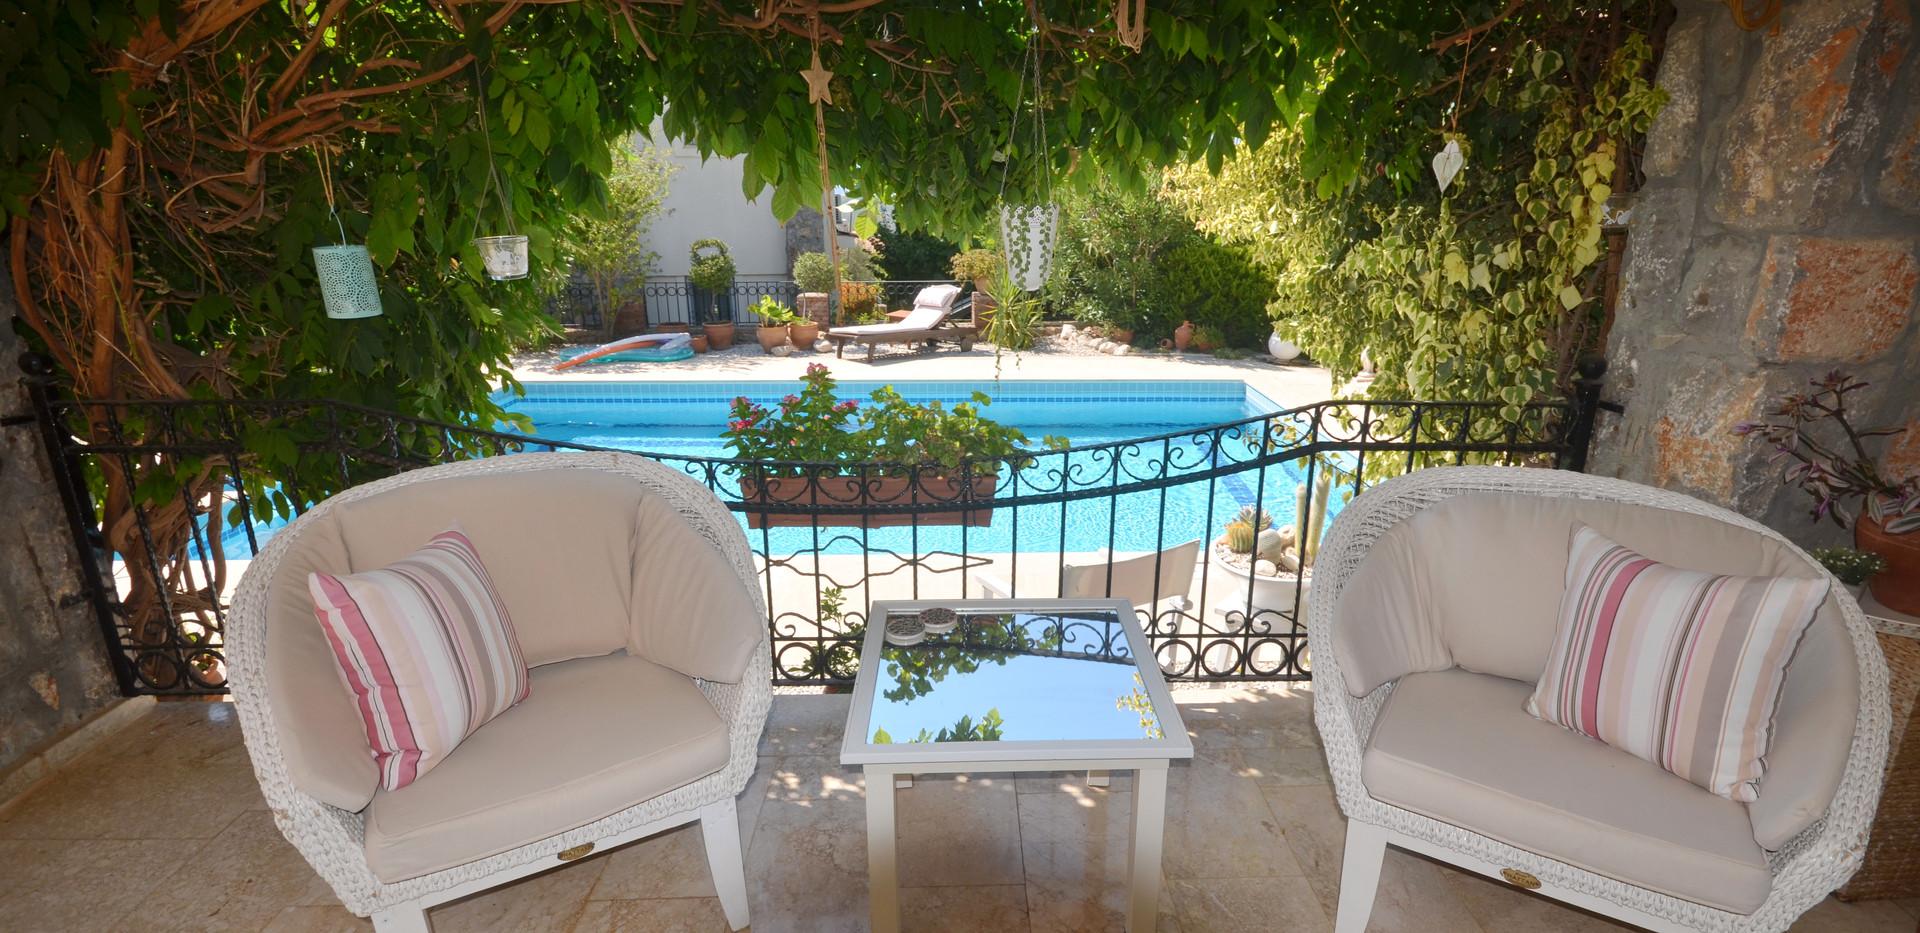 Shady Terrace Overlooks the Pool